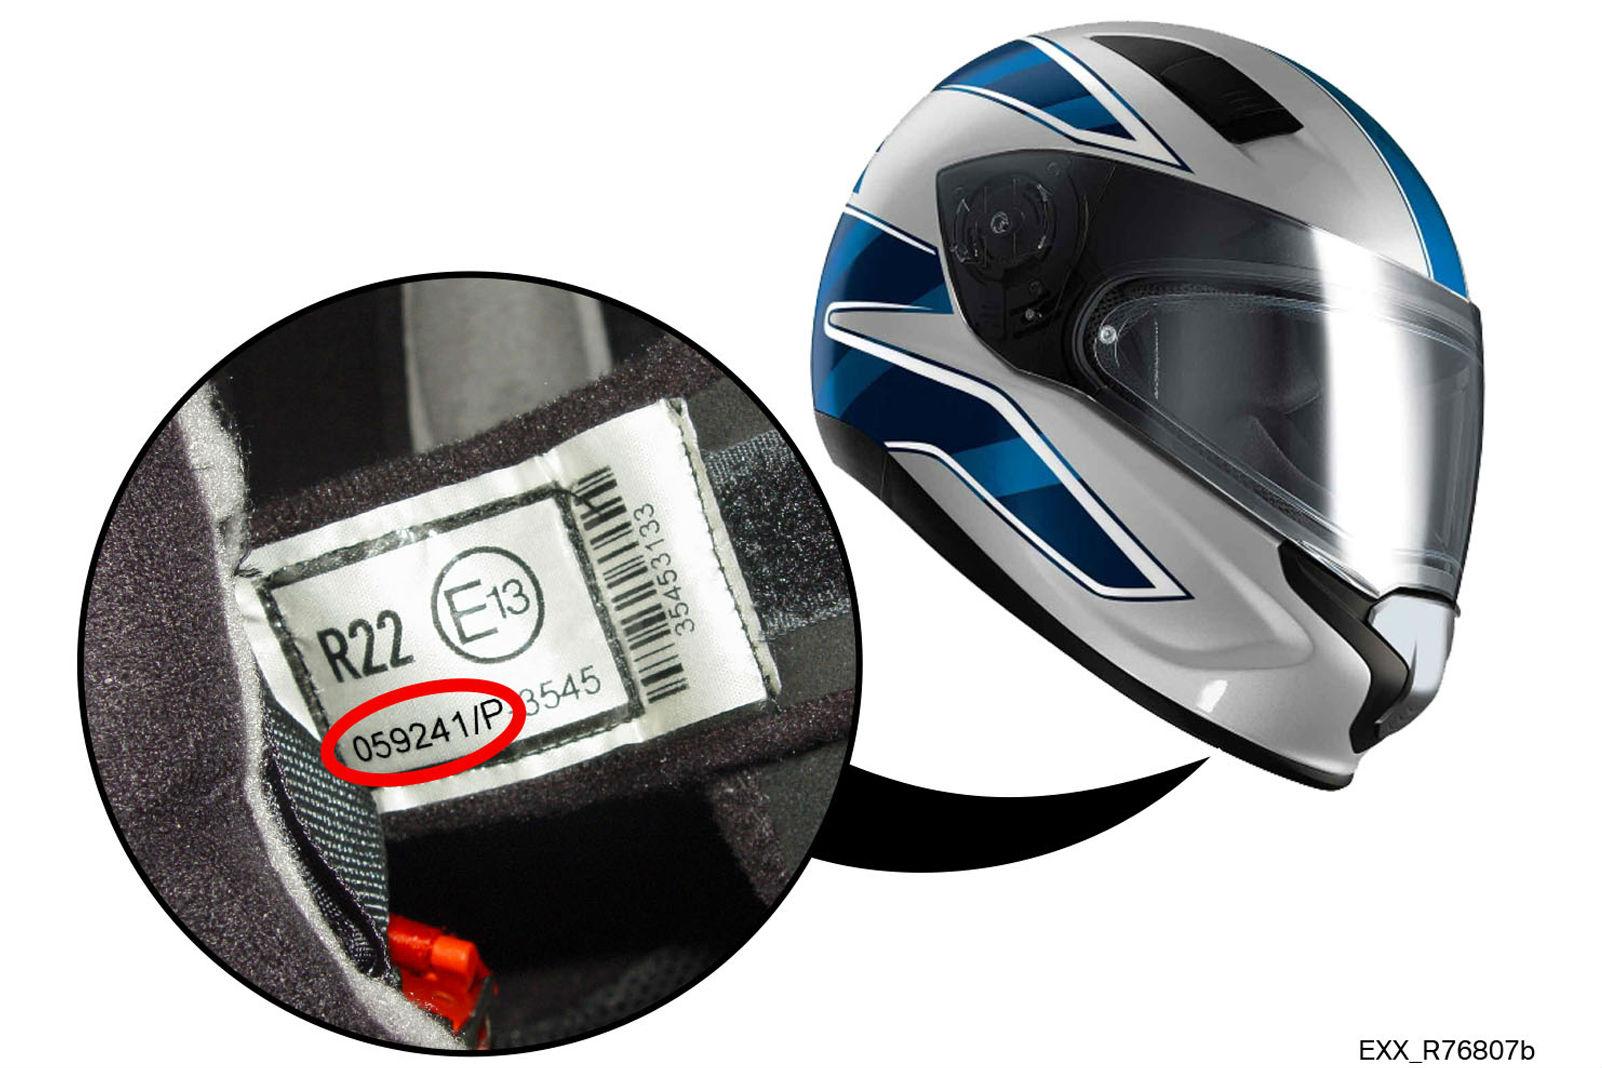 BMW helmet recall